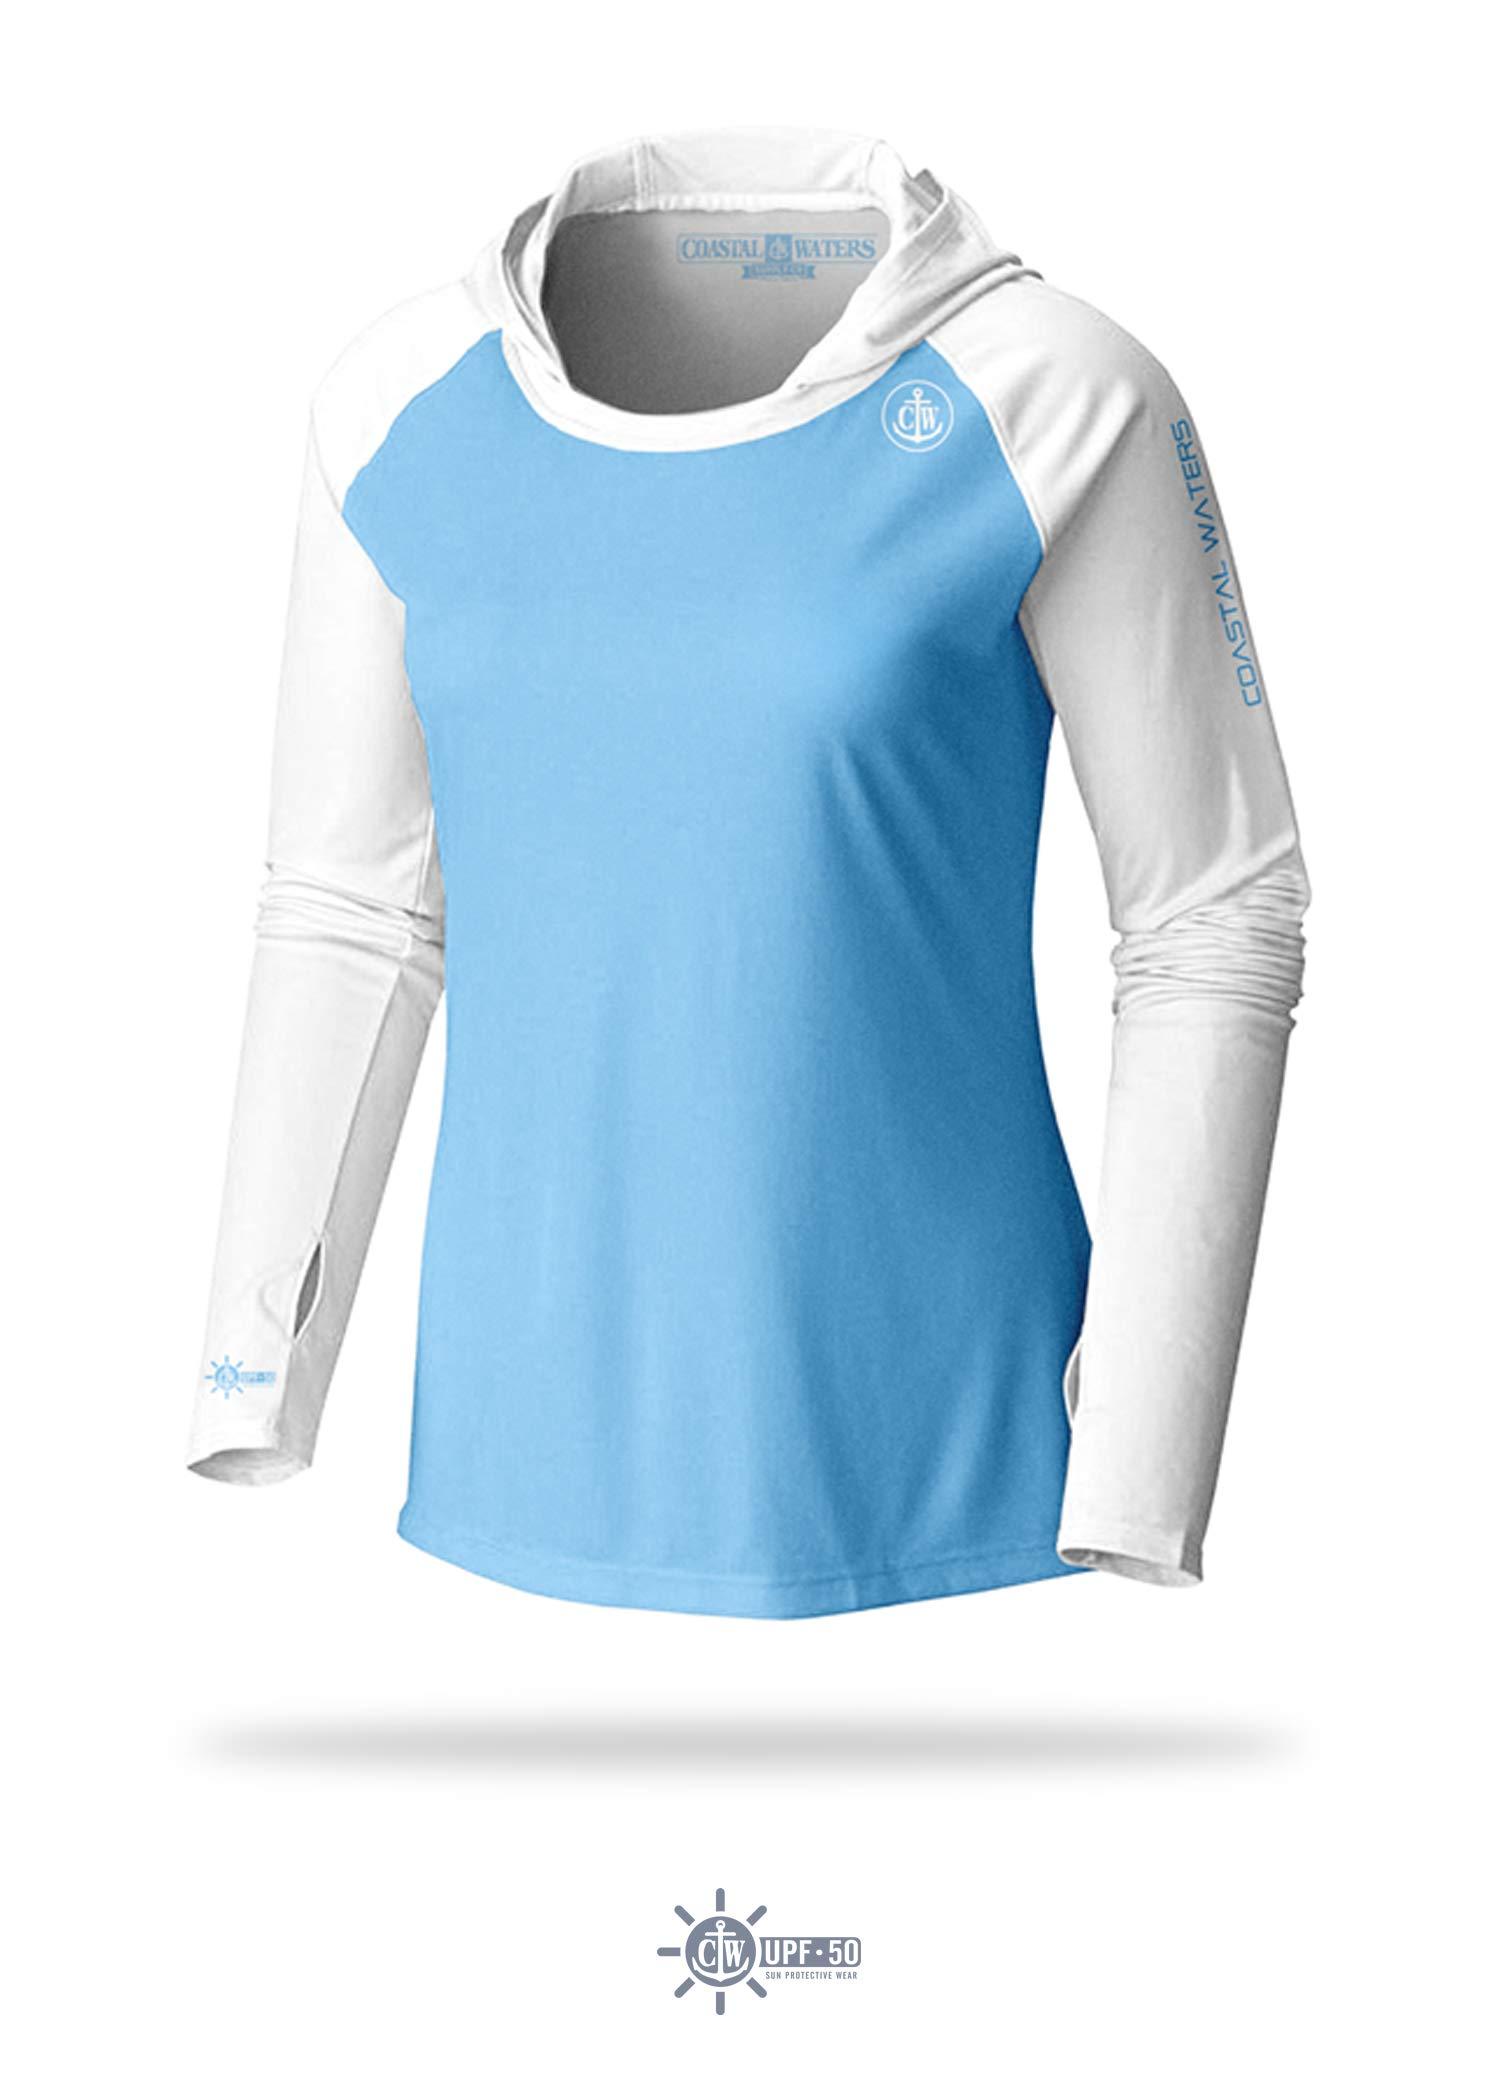 Women's Hooded Raglan Sun Protection (Sky Blue/White, Small)